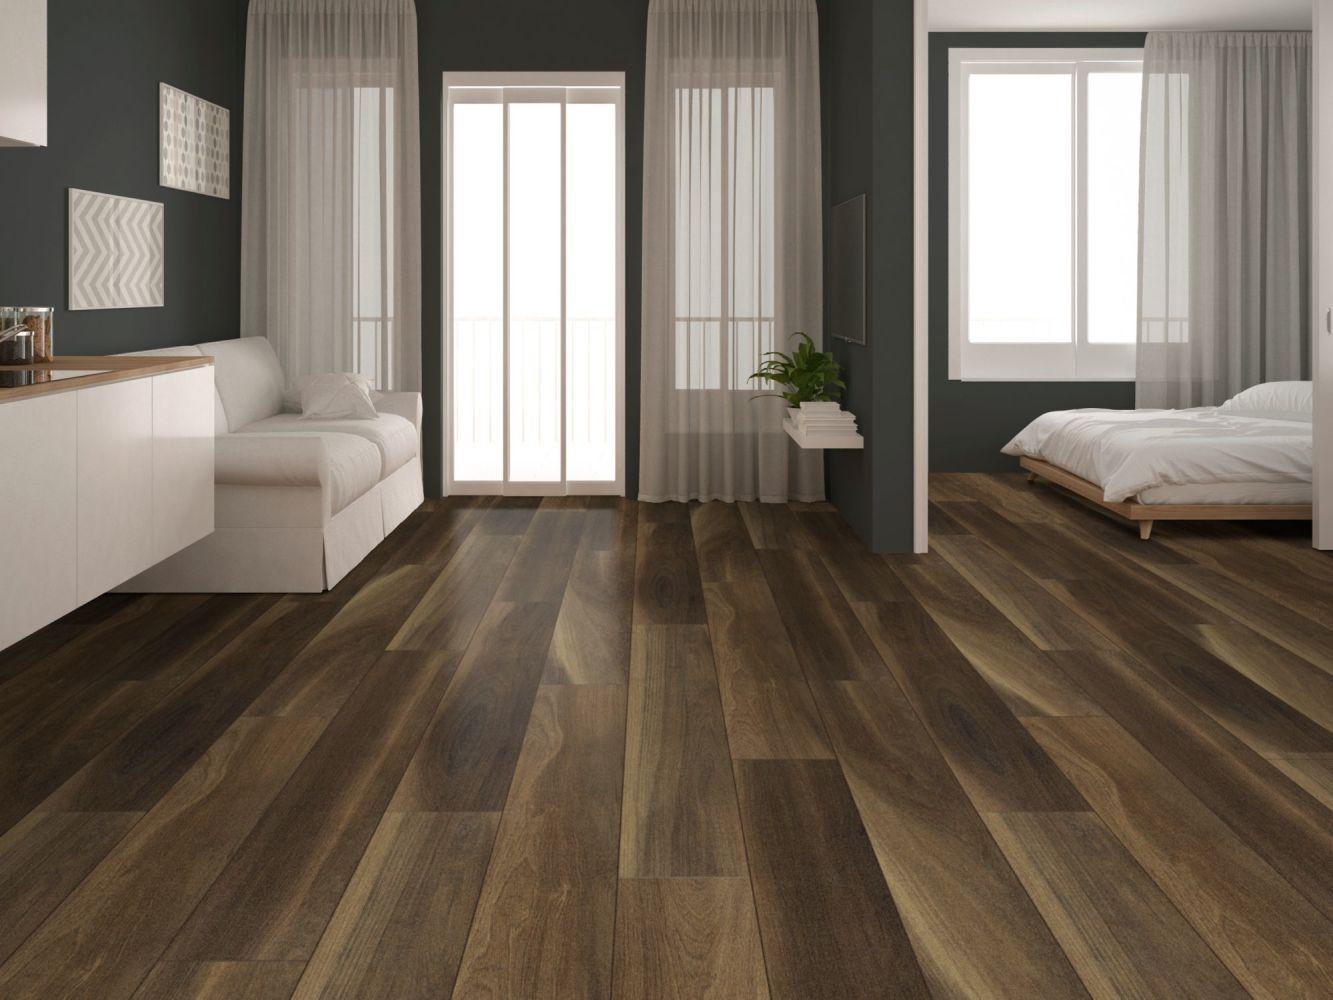 Shaw Floors Reality Homes Lava Beds Ravine Oak 00798_110RH